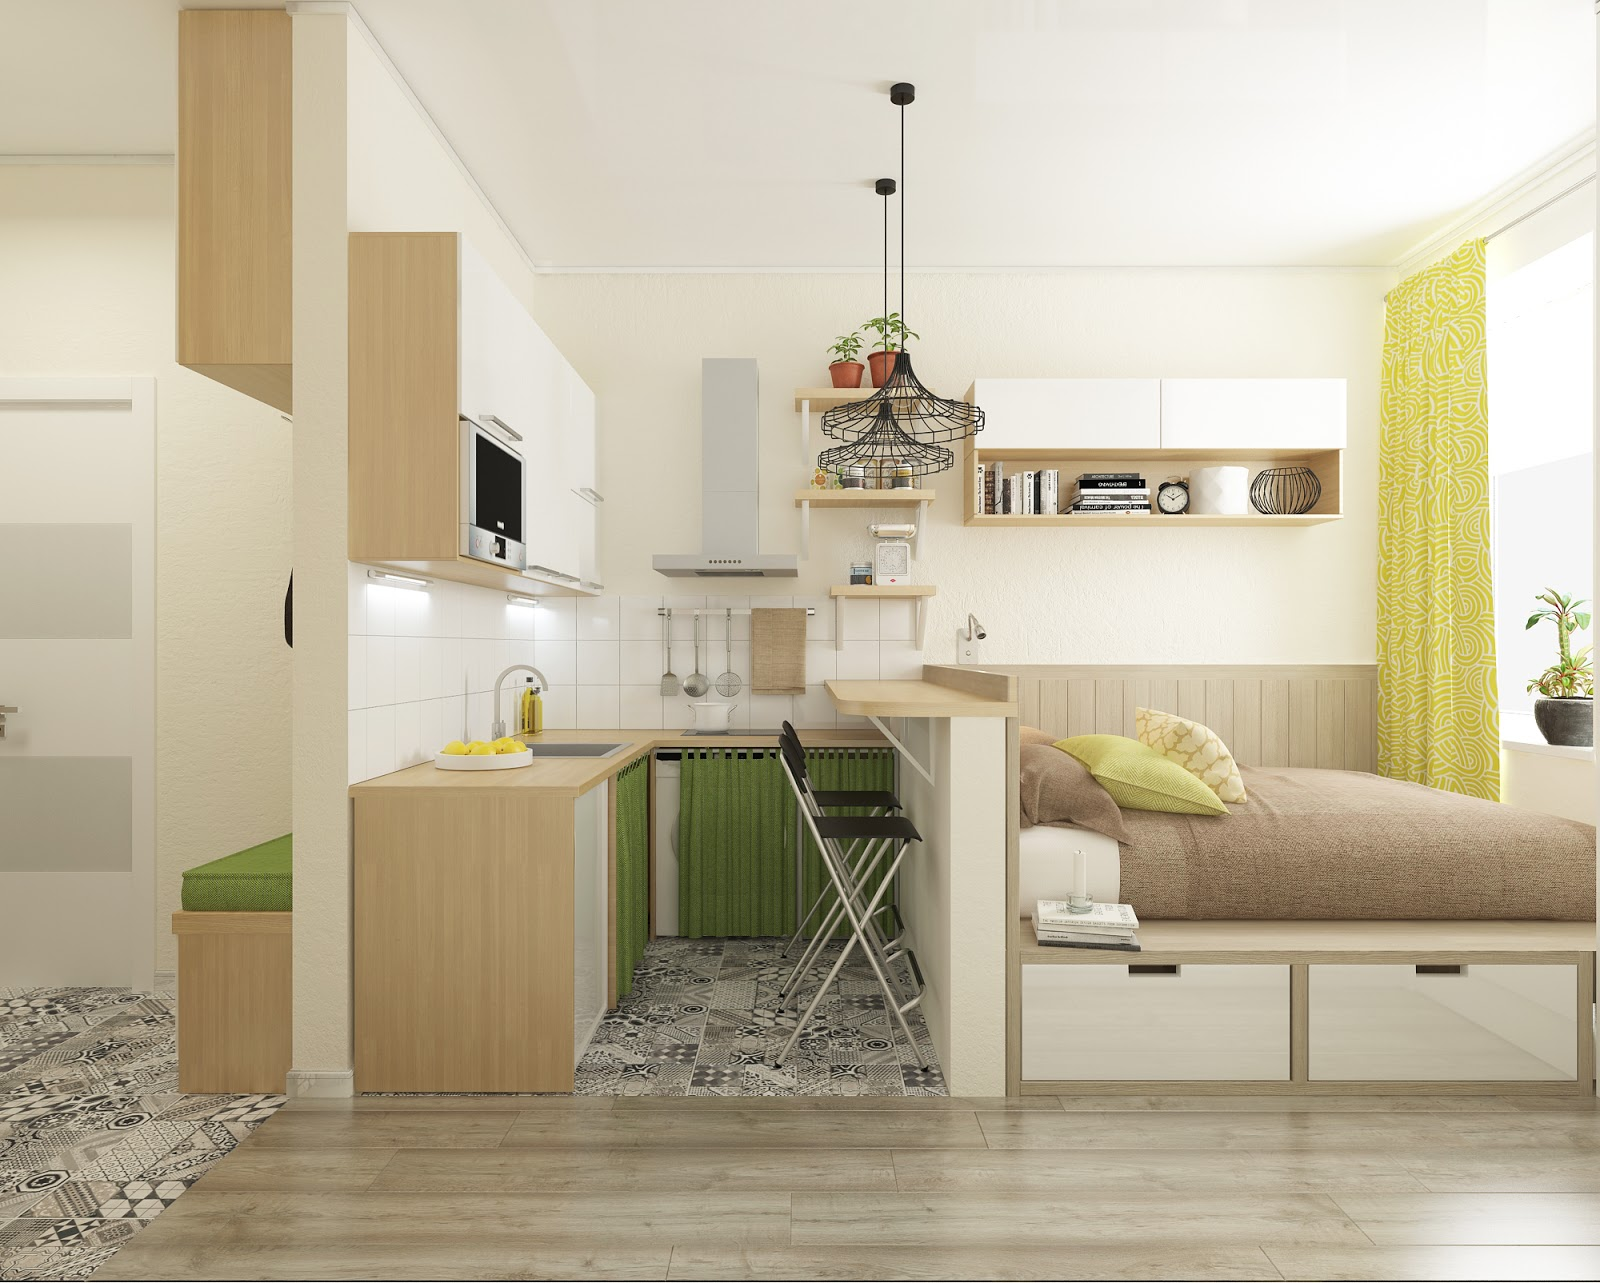 Дизайн квартиры-студии 18 кв.м